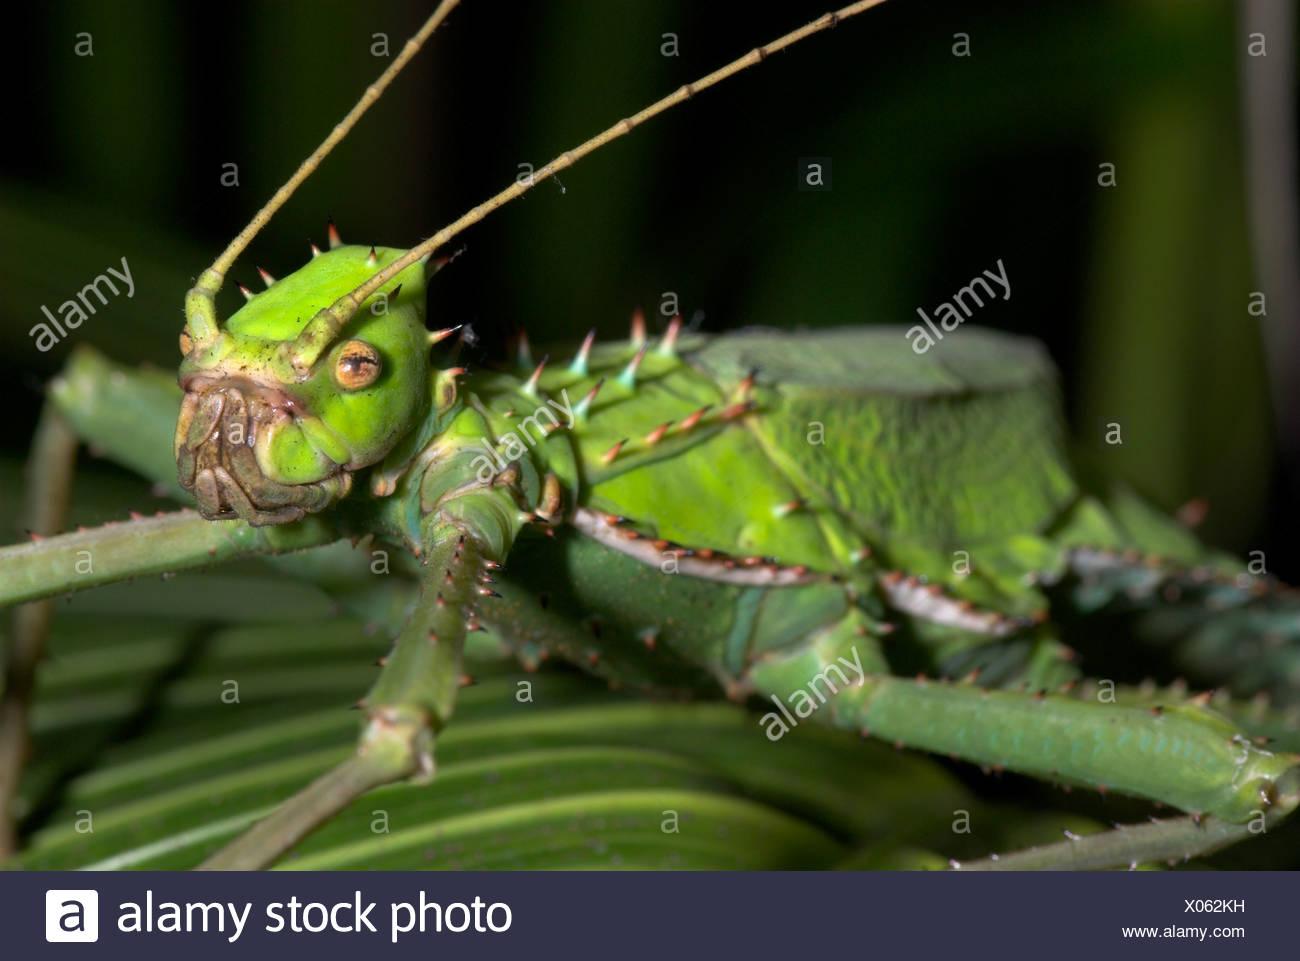 Jungle Nymph Heteropteryx Dilatata Stock Photo